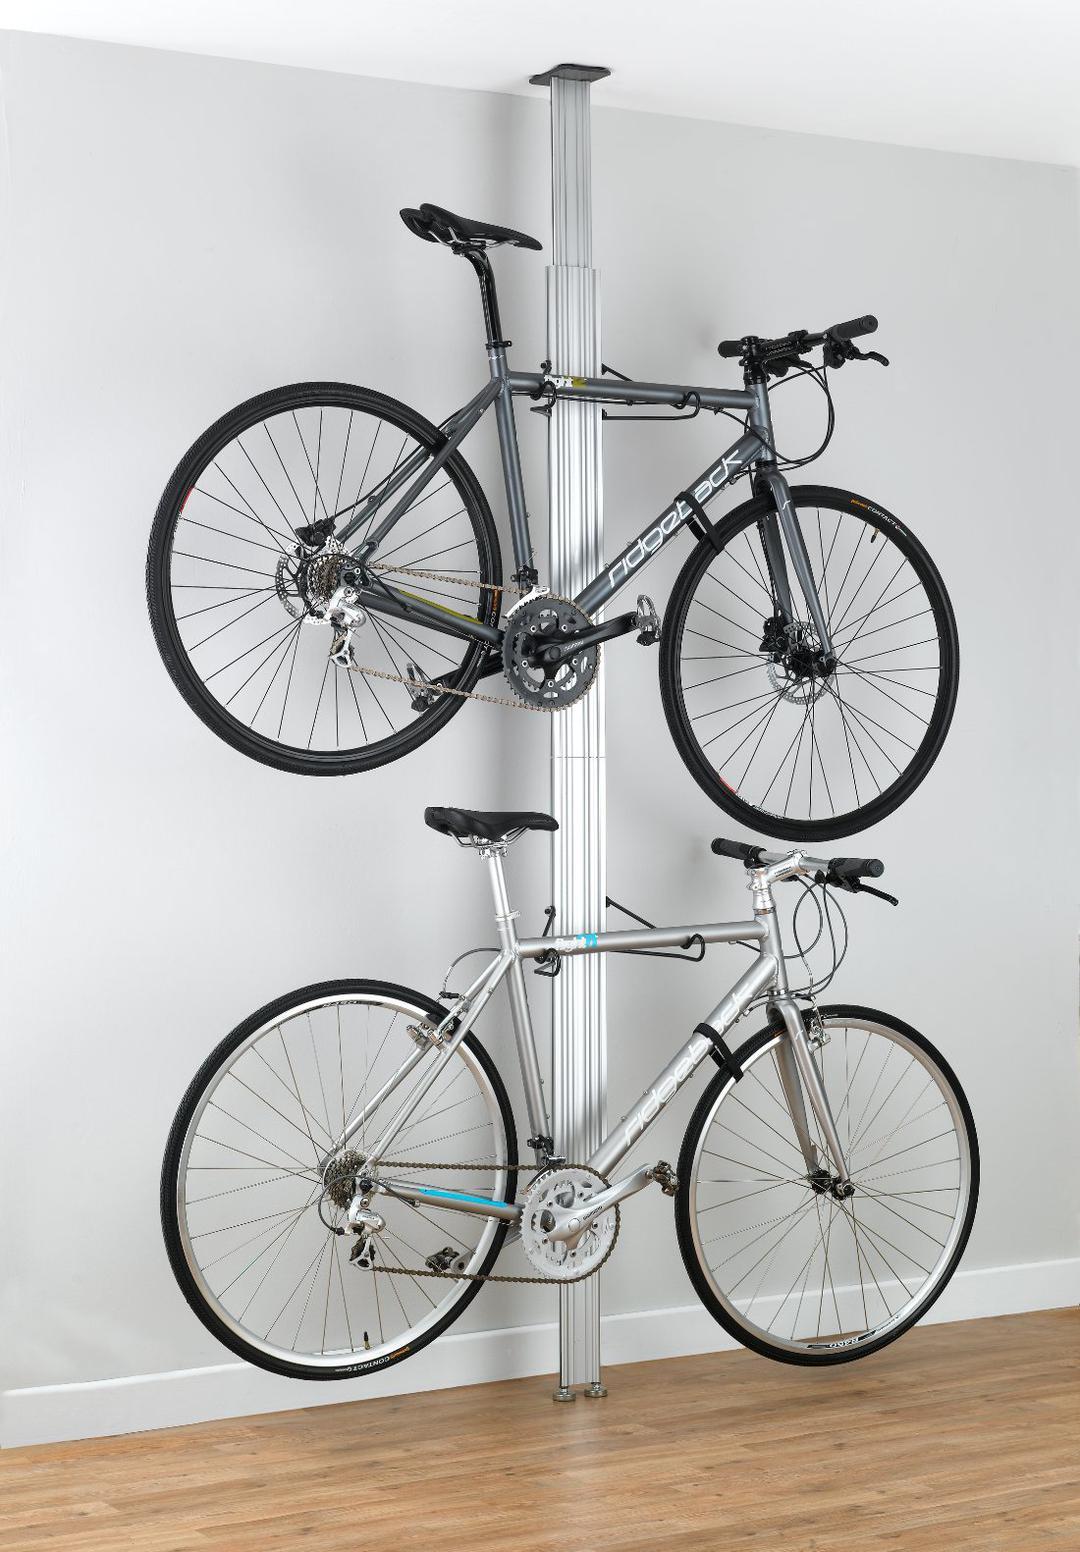 Ceiling Bike Rack >> Bike Storage Racks Bike Lifts Family Bicycle Racks Canoe Kayak